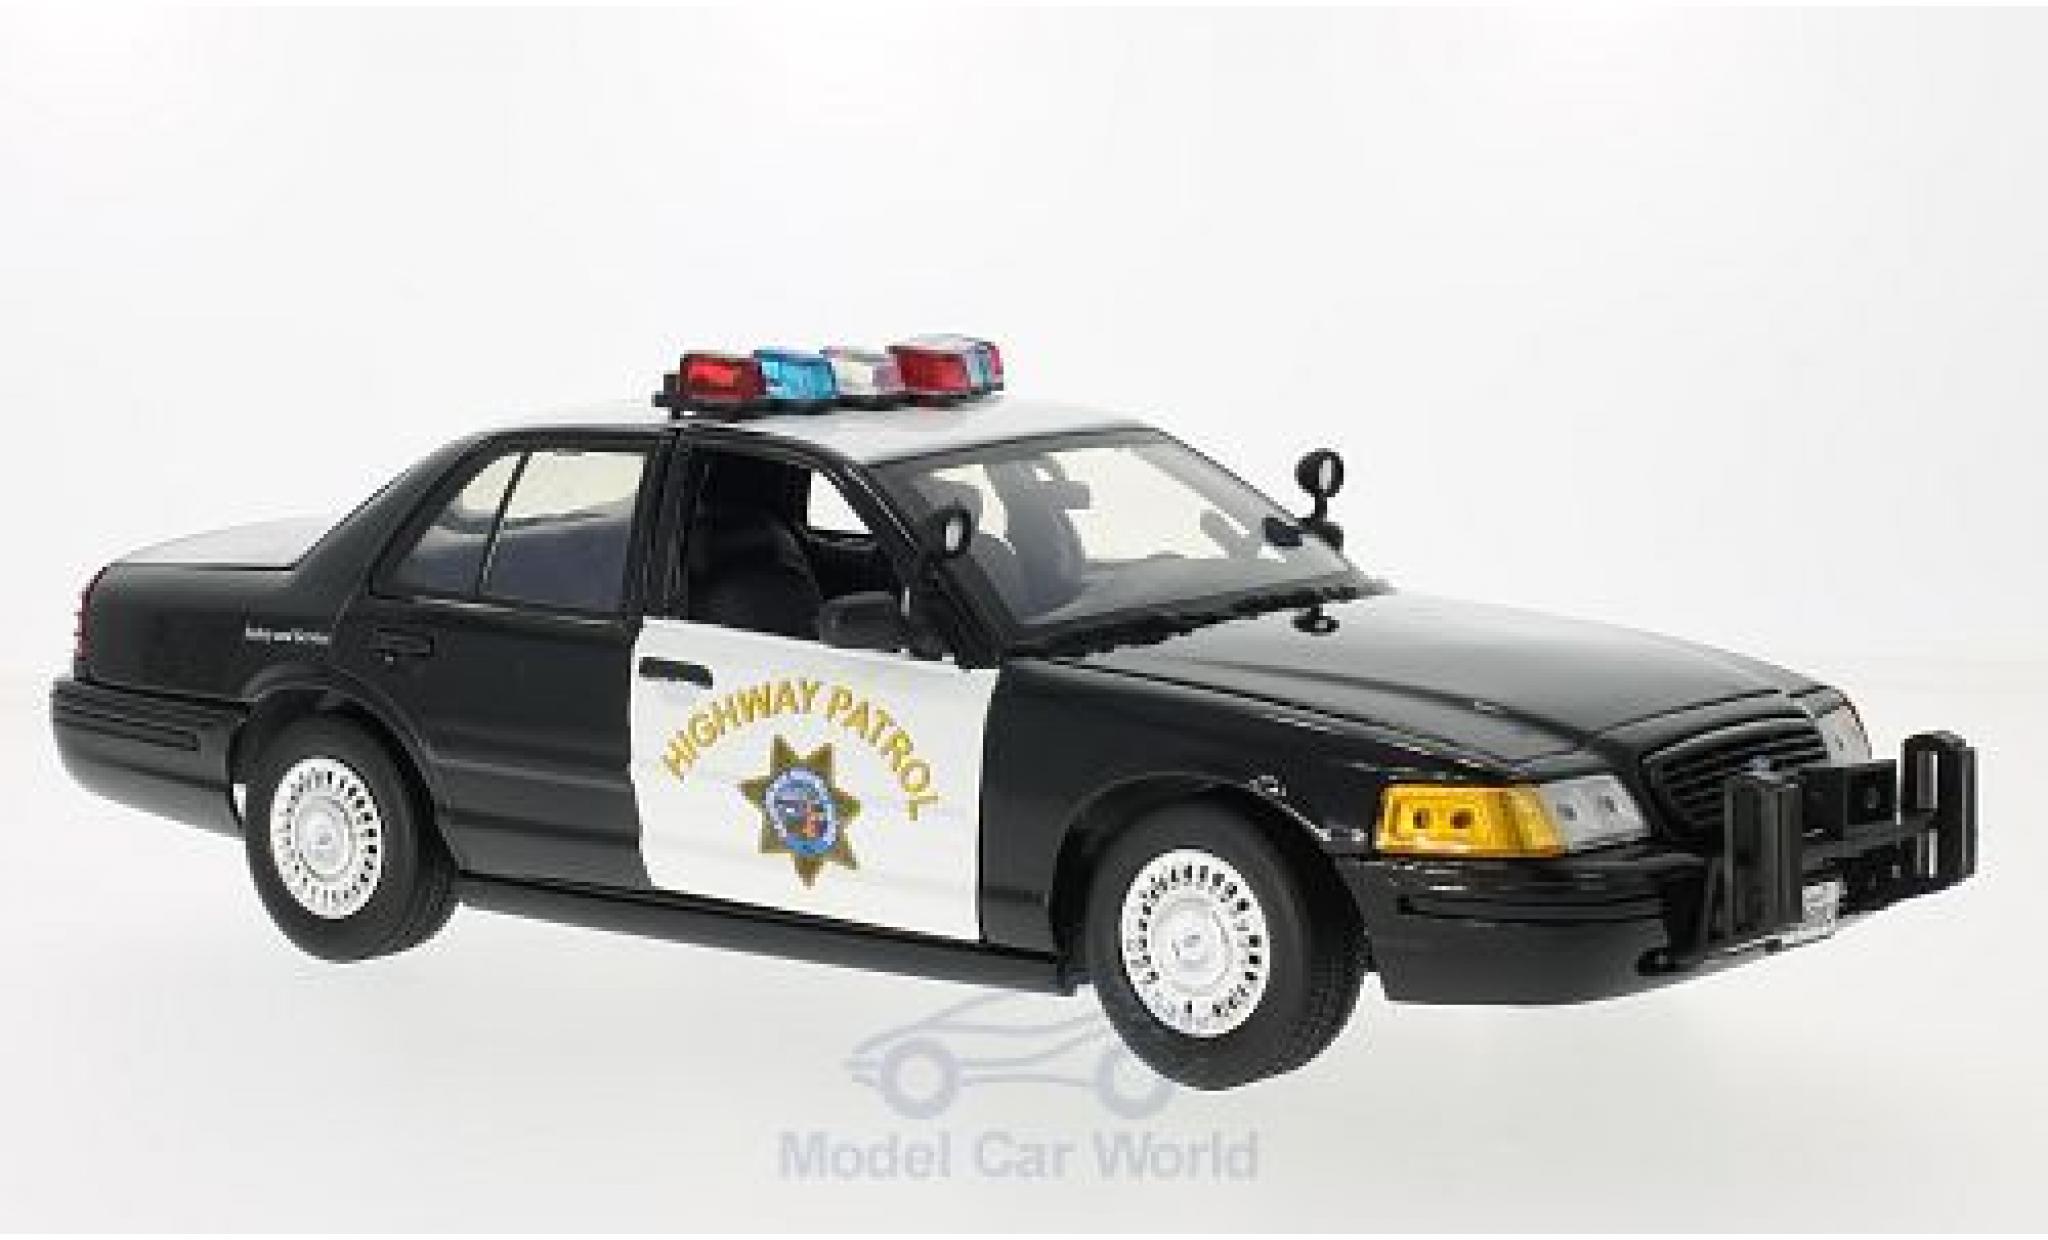 Ford Crown 1/18 Motormax Victoria Police Interceptor California Highway Patrol 2001